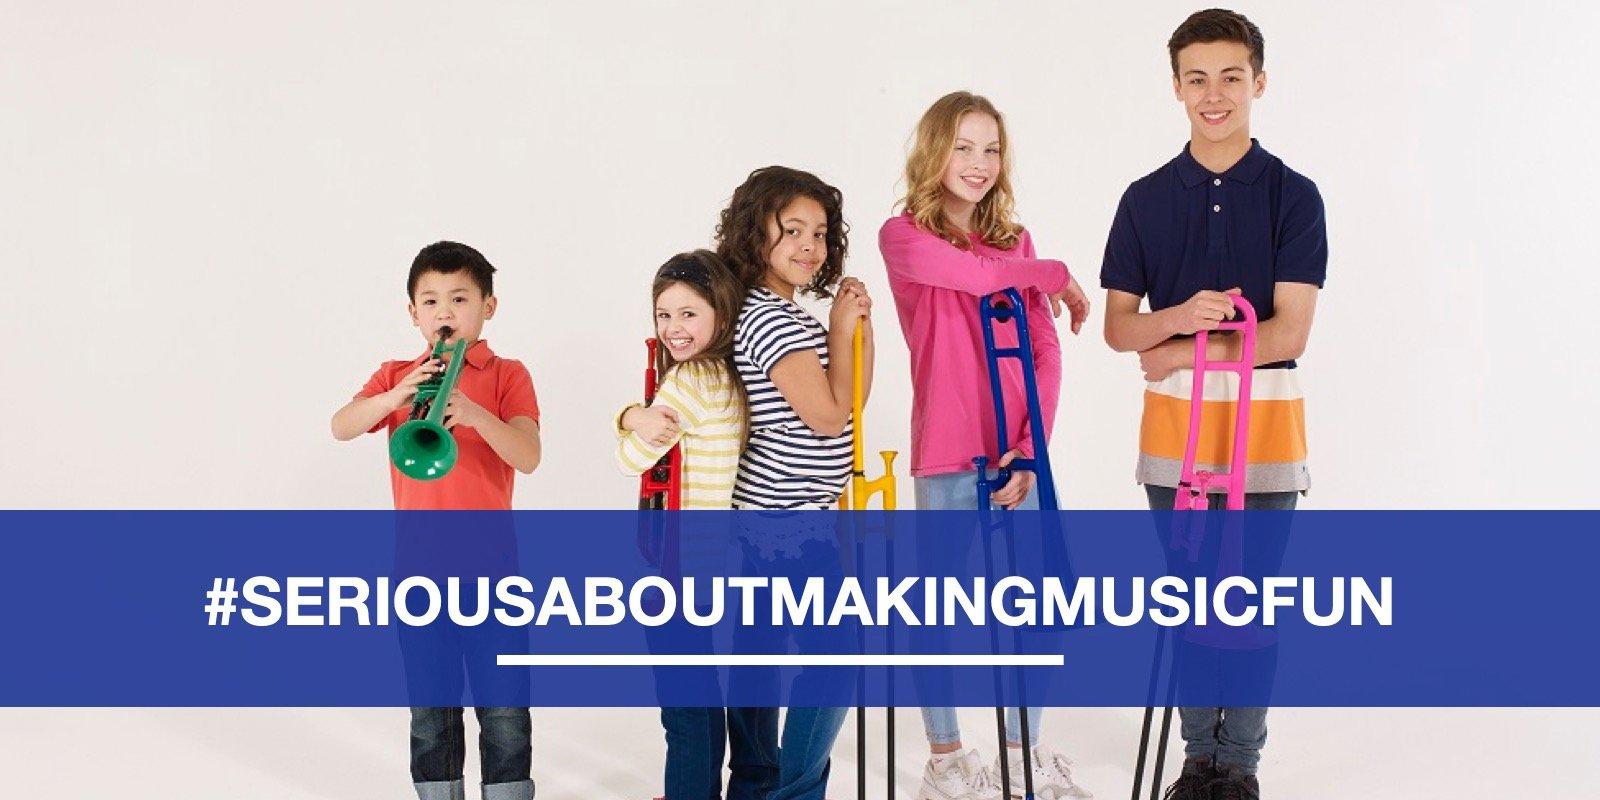 seriousaboutmakingmusicfun banner